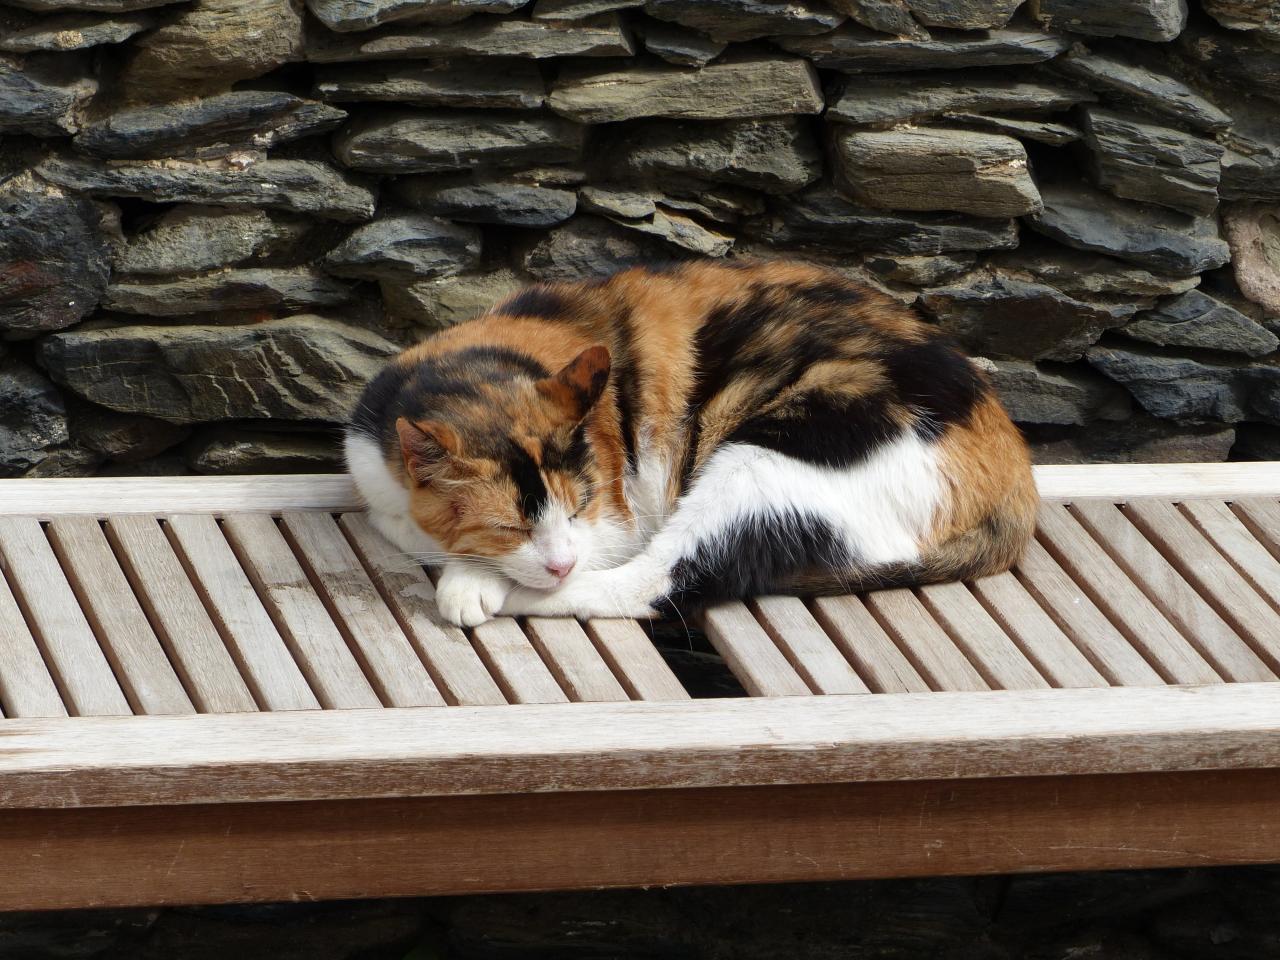 A spanish cat